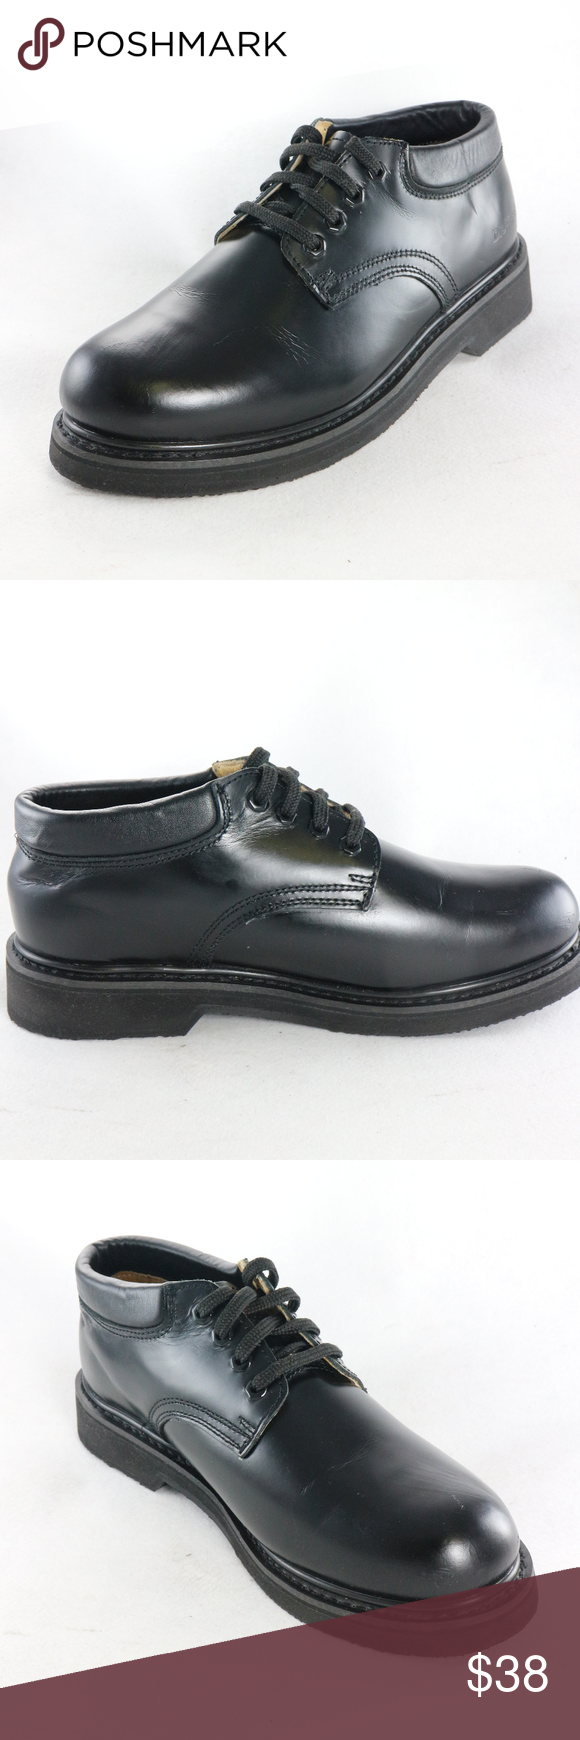 Black Leather Soft Toe Work Oxford